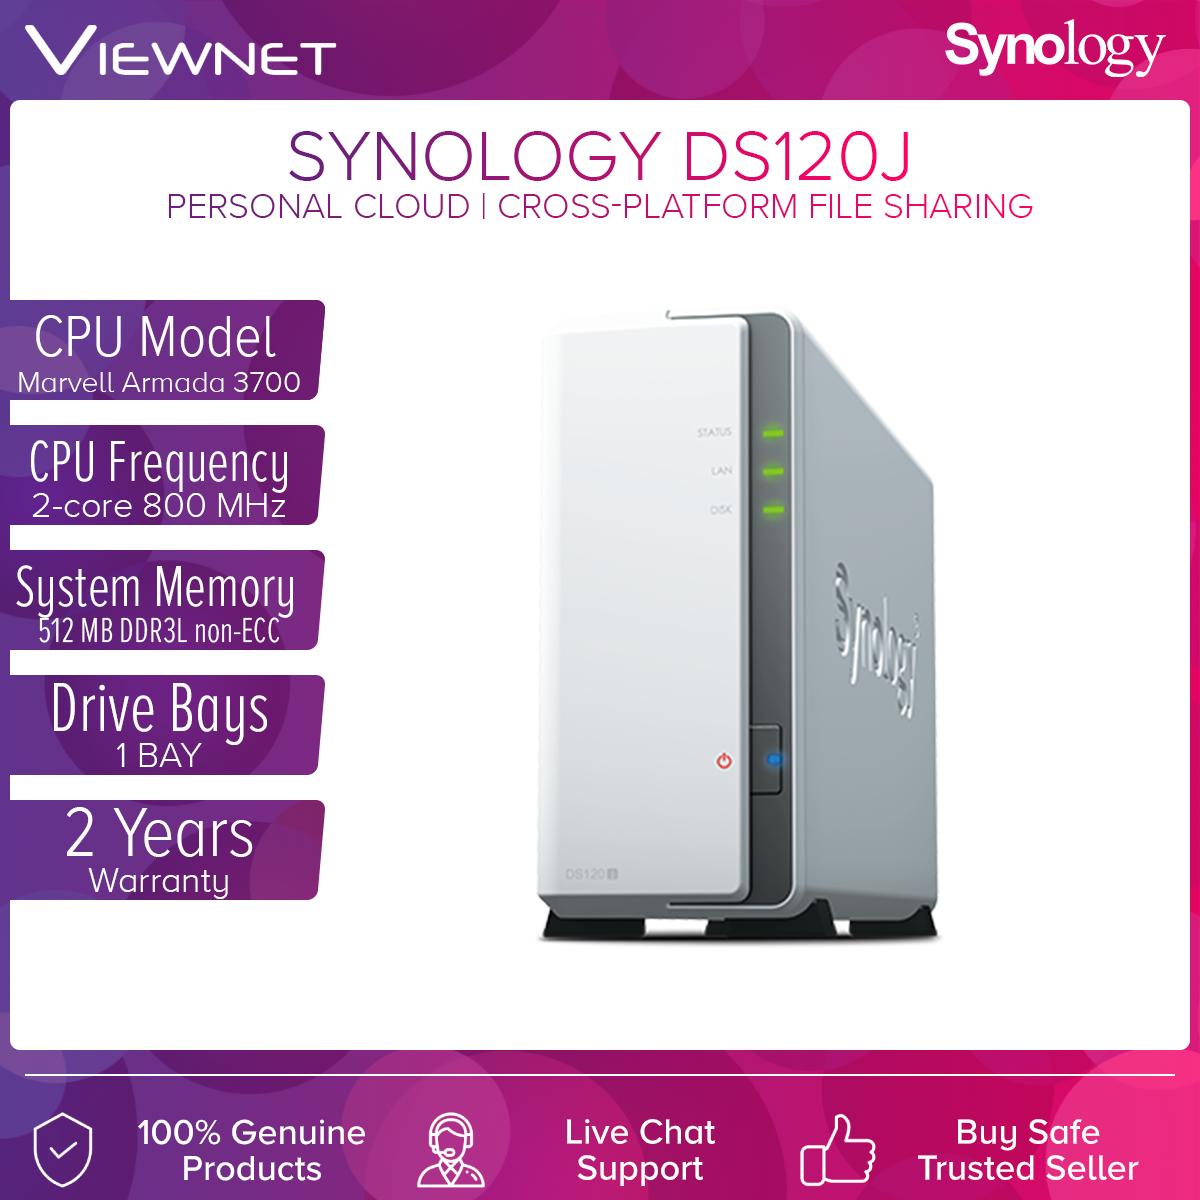 Synology DS120j NAS DiskStation 1-Bay NAS 2-Core Processor Ideal Data Backup Storage for Entry Level